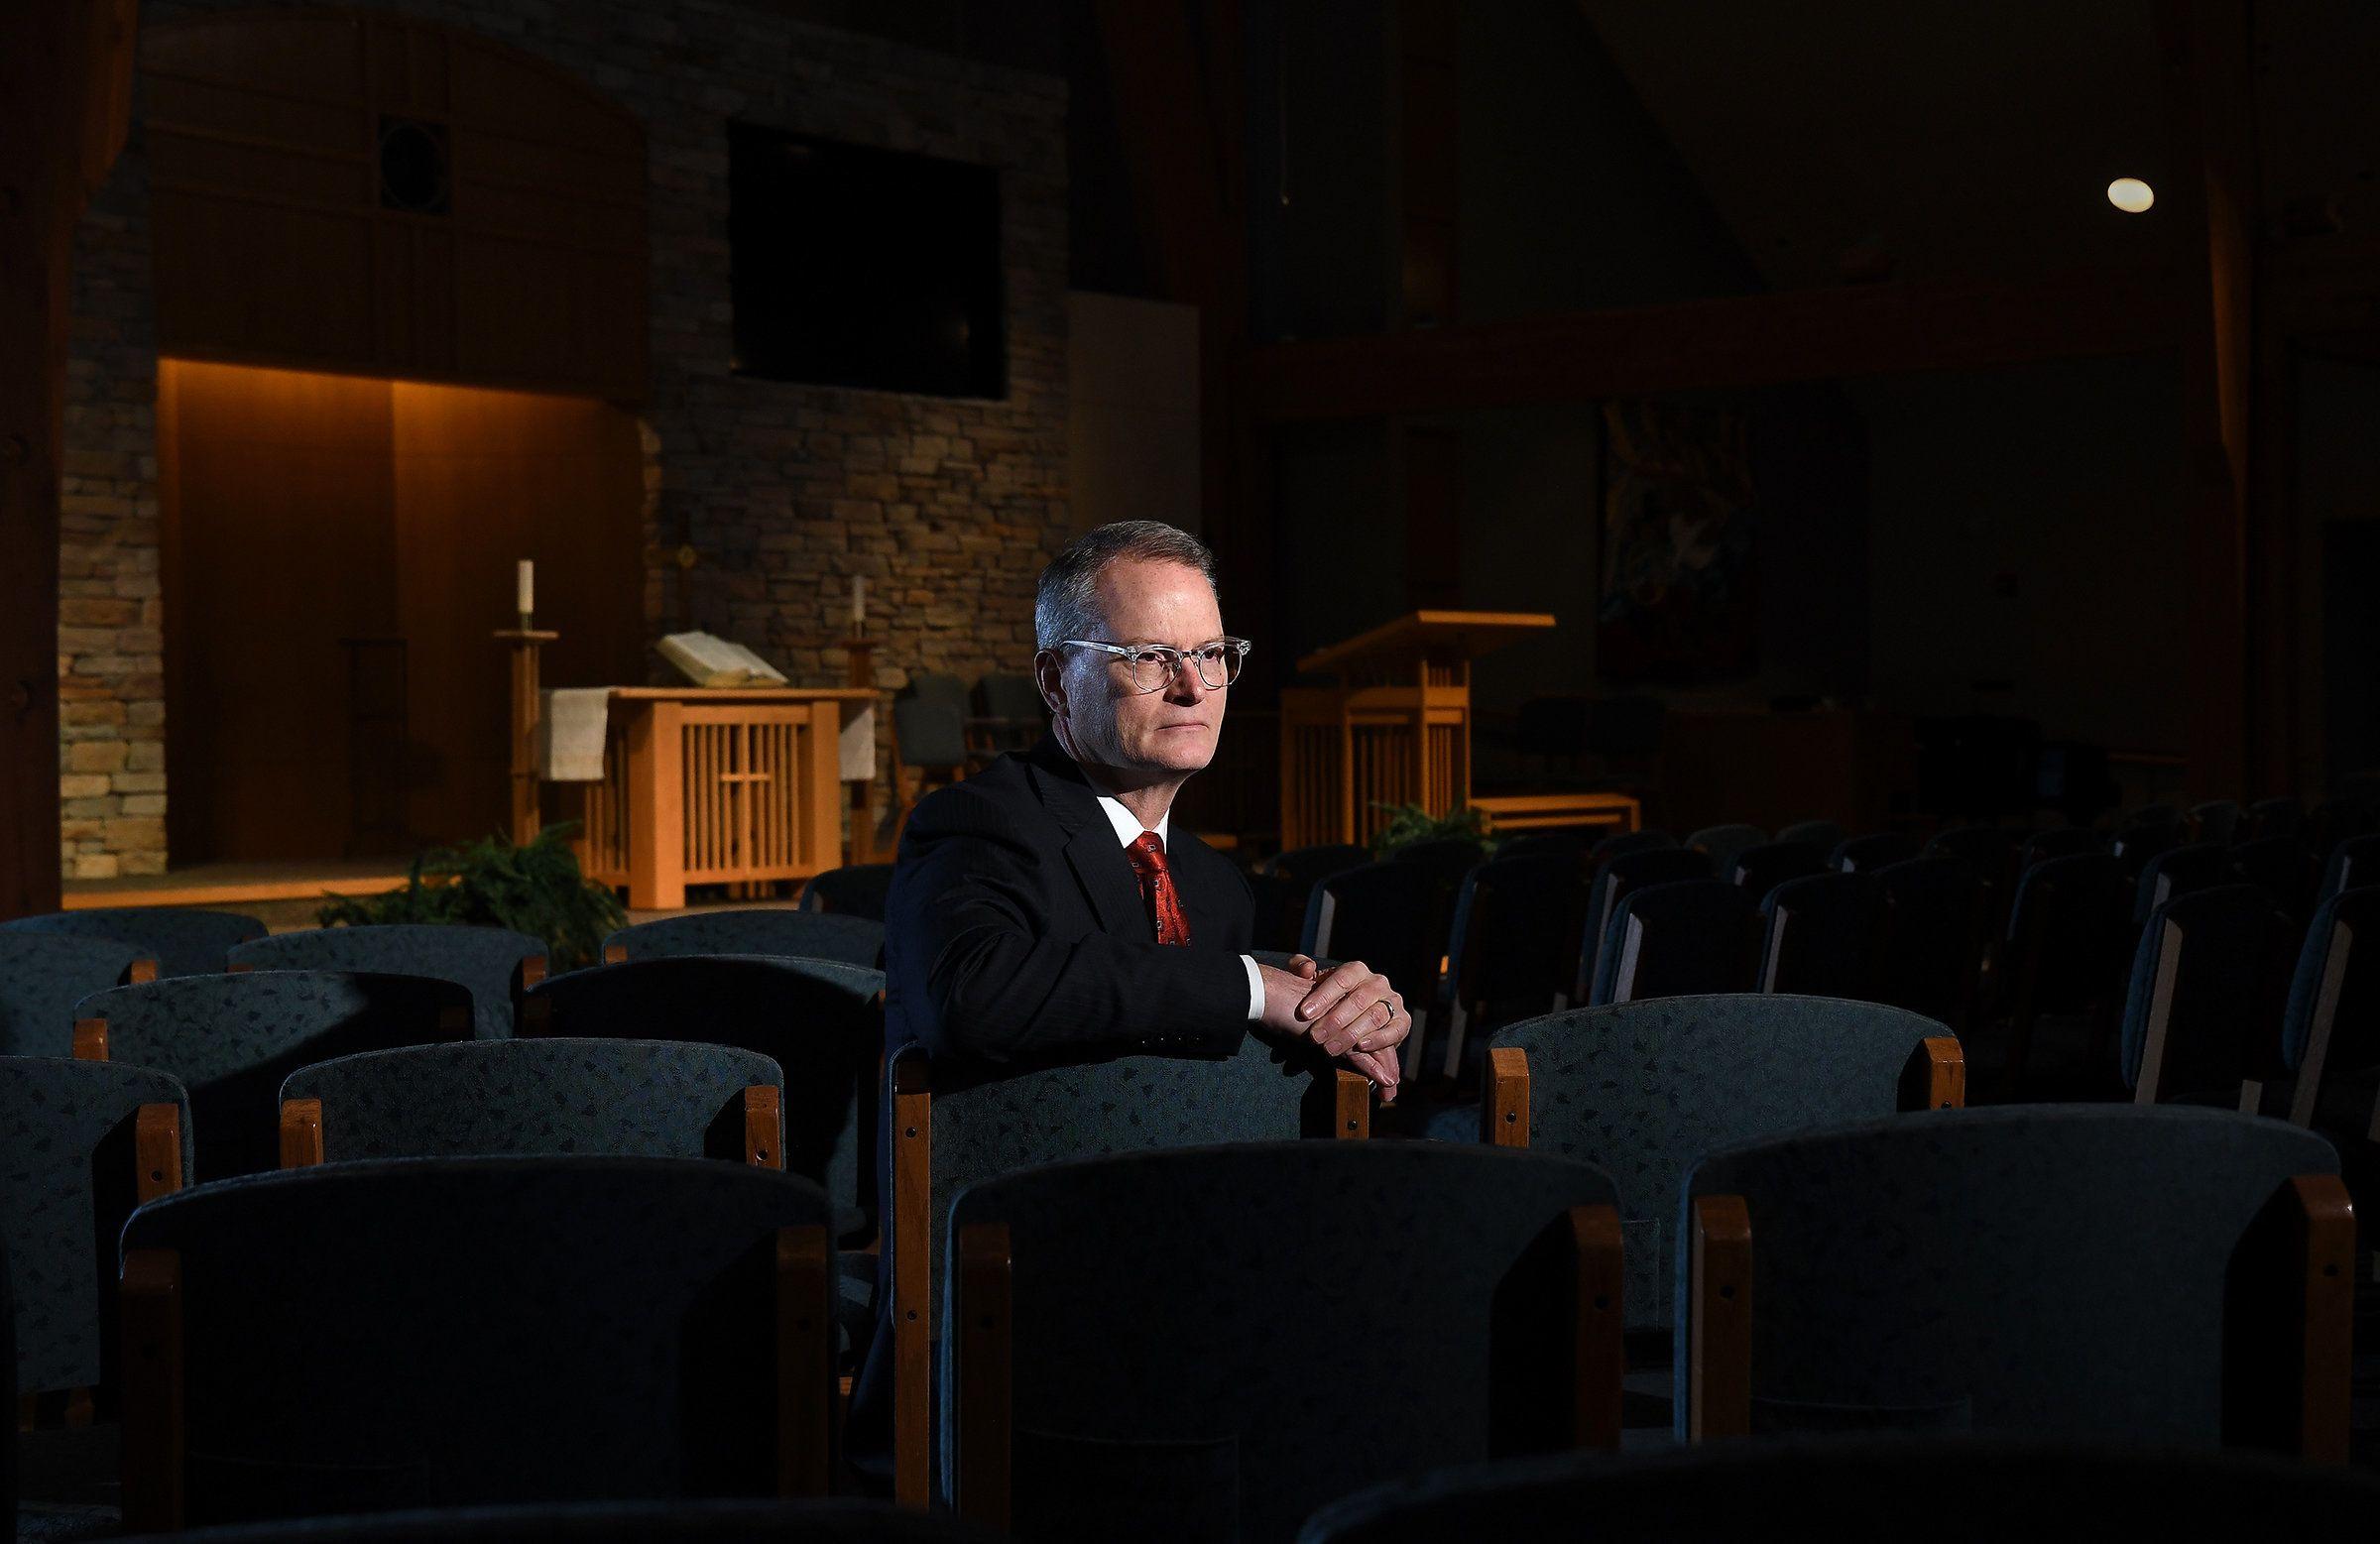 Adam Hamilton is pastor of United Methodist Church of the Resurrection in the Johnson County suburb of Leawood. Hamilton says